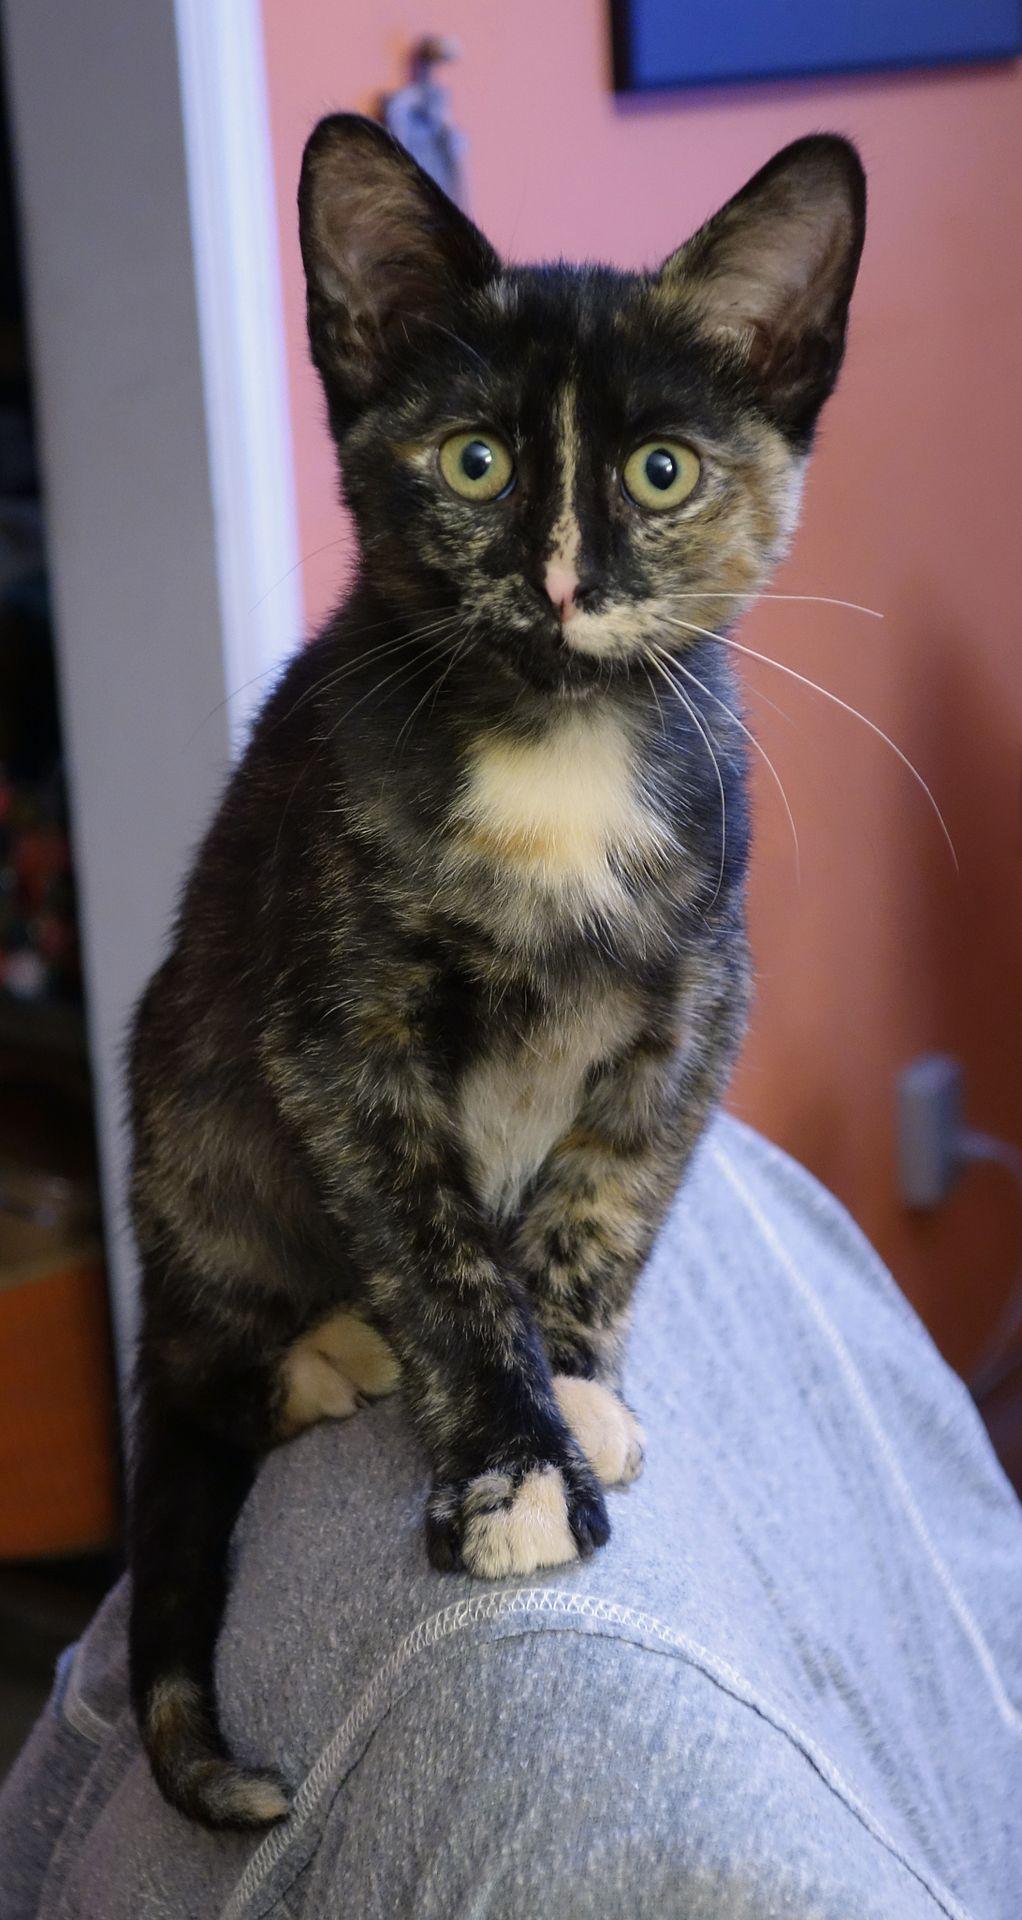 A Tortoiseshell Kitten With The Split Face Pattern And Black And White Whiskers Tortoiseshell Cat Names Kitten Names Tortoise Shell Cat